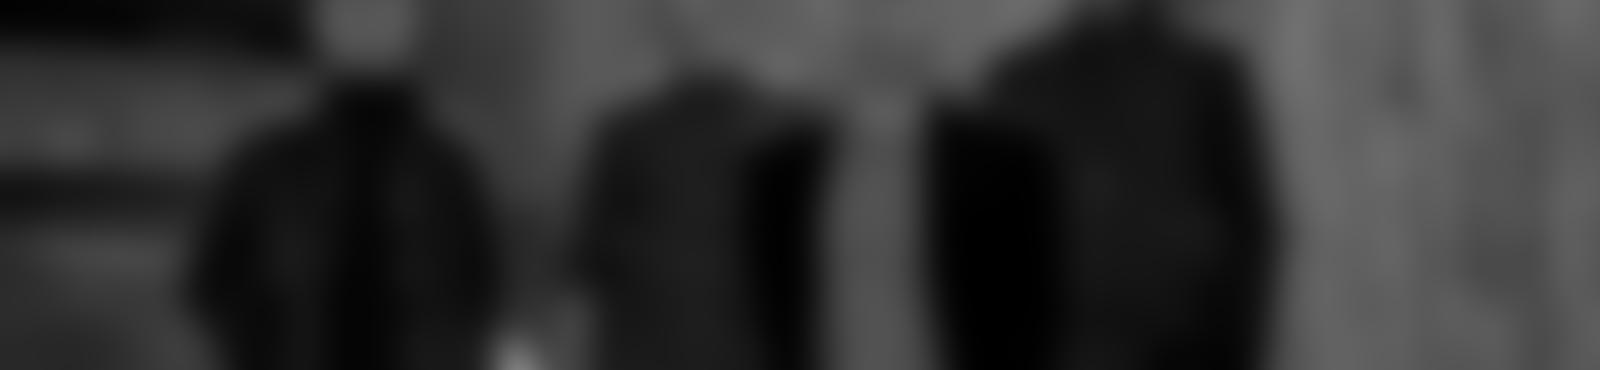 Blurred 0ecde1dc 4162 4ee3 897b cad7363c60e5